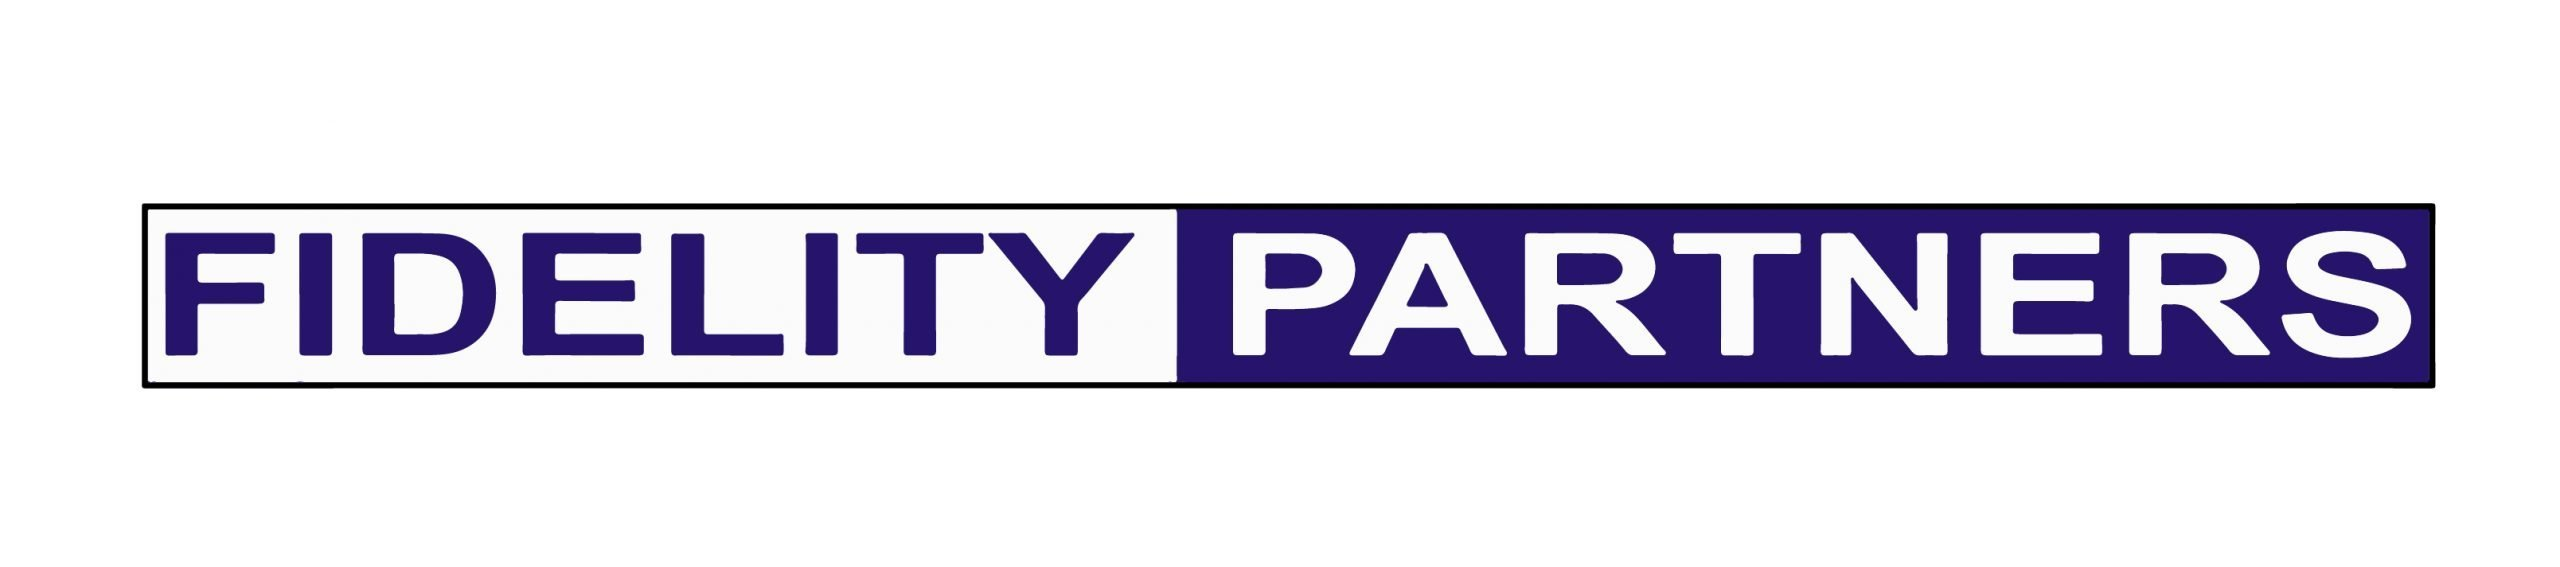 Fidelity Partners